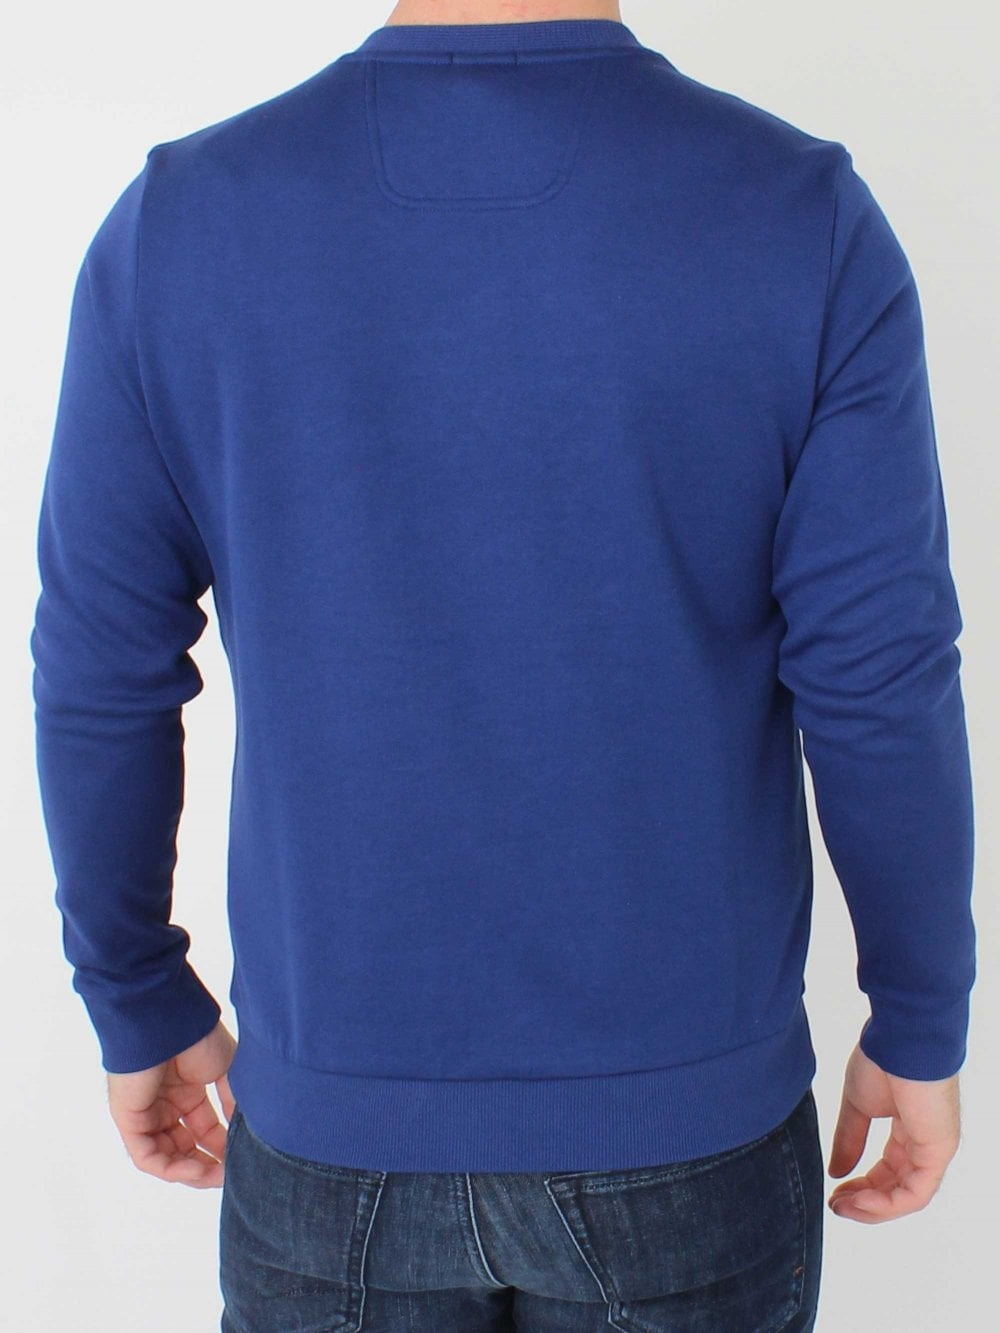 Hugo Boss Salbo Sweat in Dark Blue   Northern Threads 5824ccb1e41d